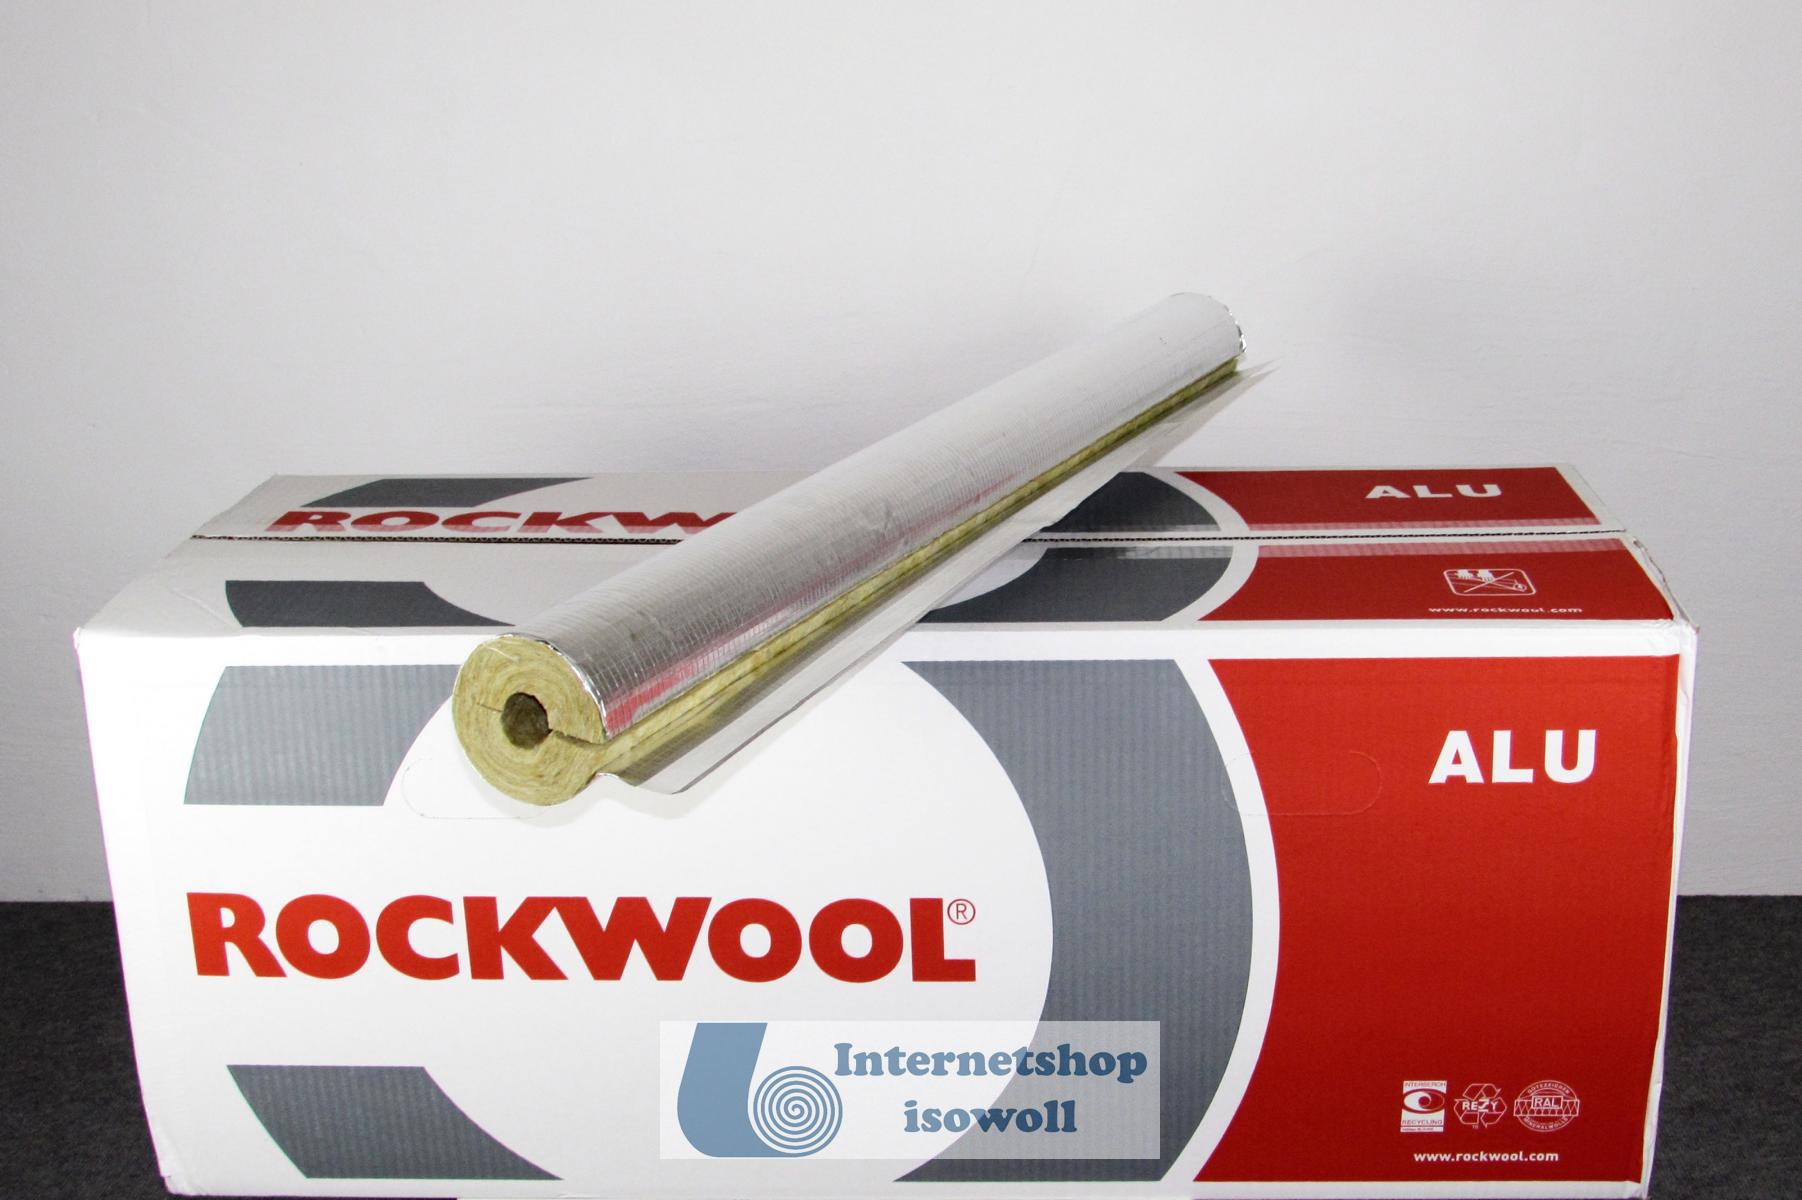 rockwool alukaschierte rohrschale 800 im karton isowoll onlineshop f r isolierd mmstoffe. Black Bedroom Furniture Sets. Home Design Ideas